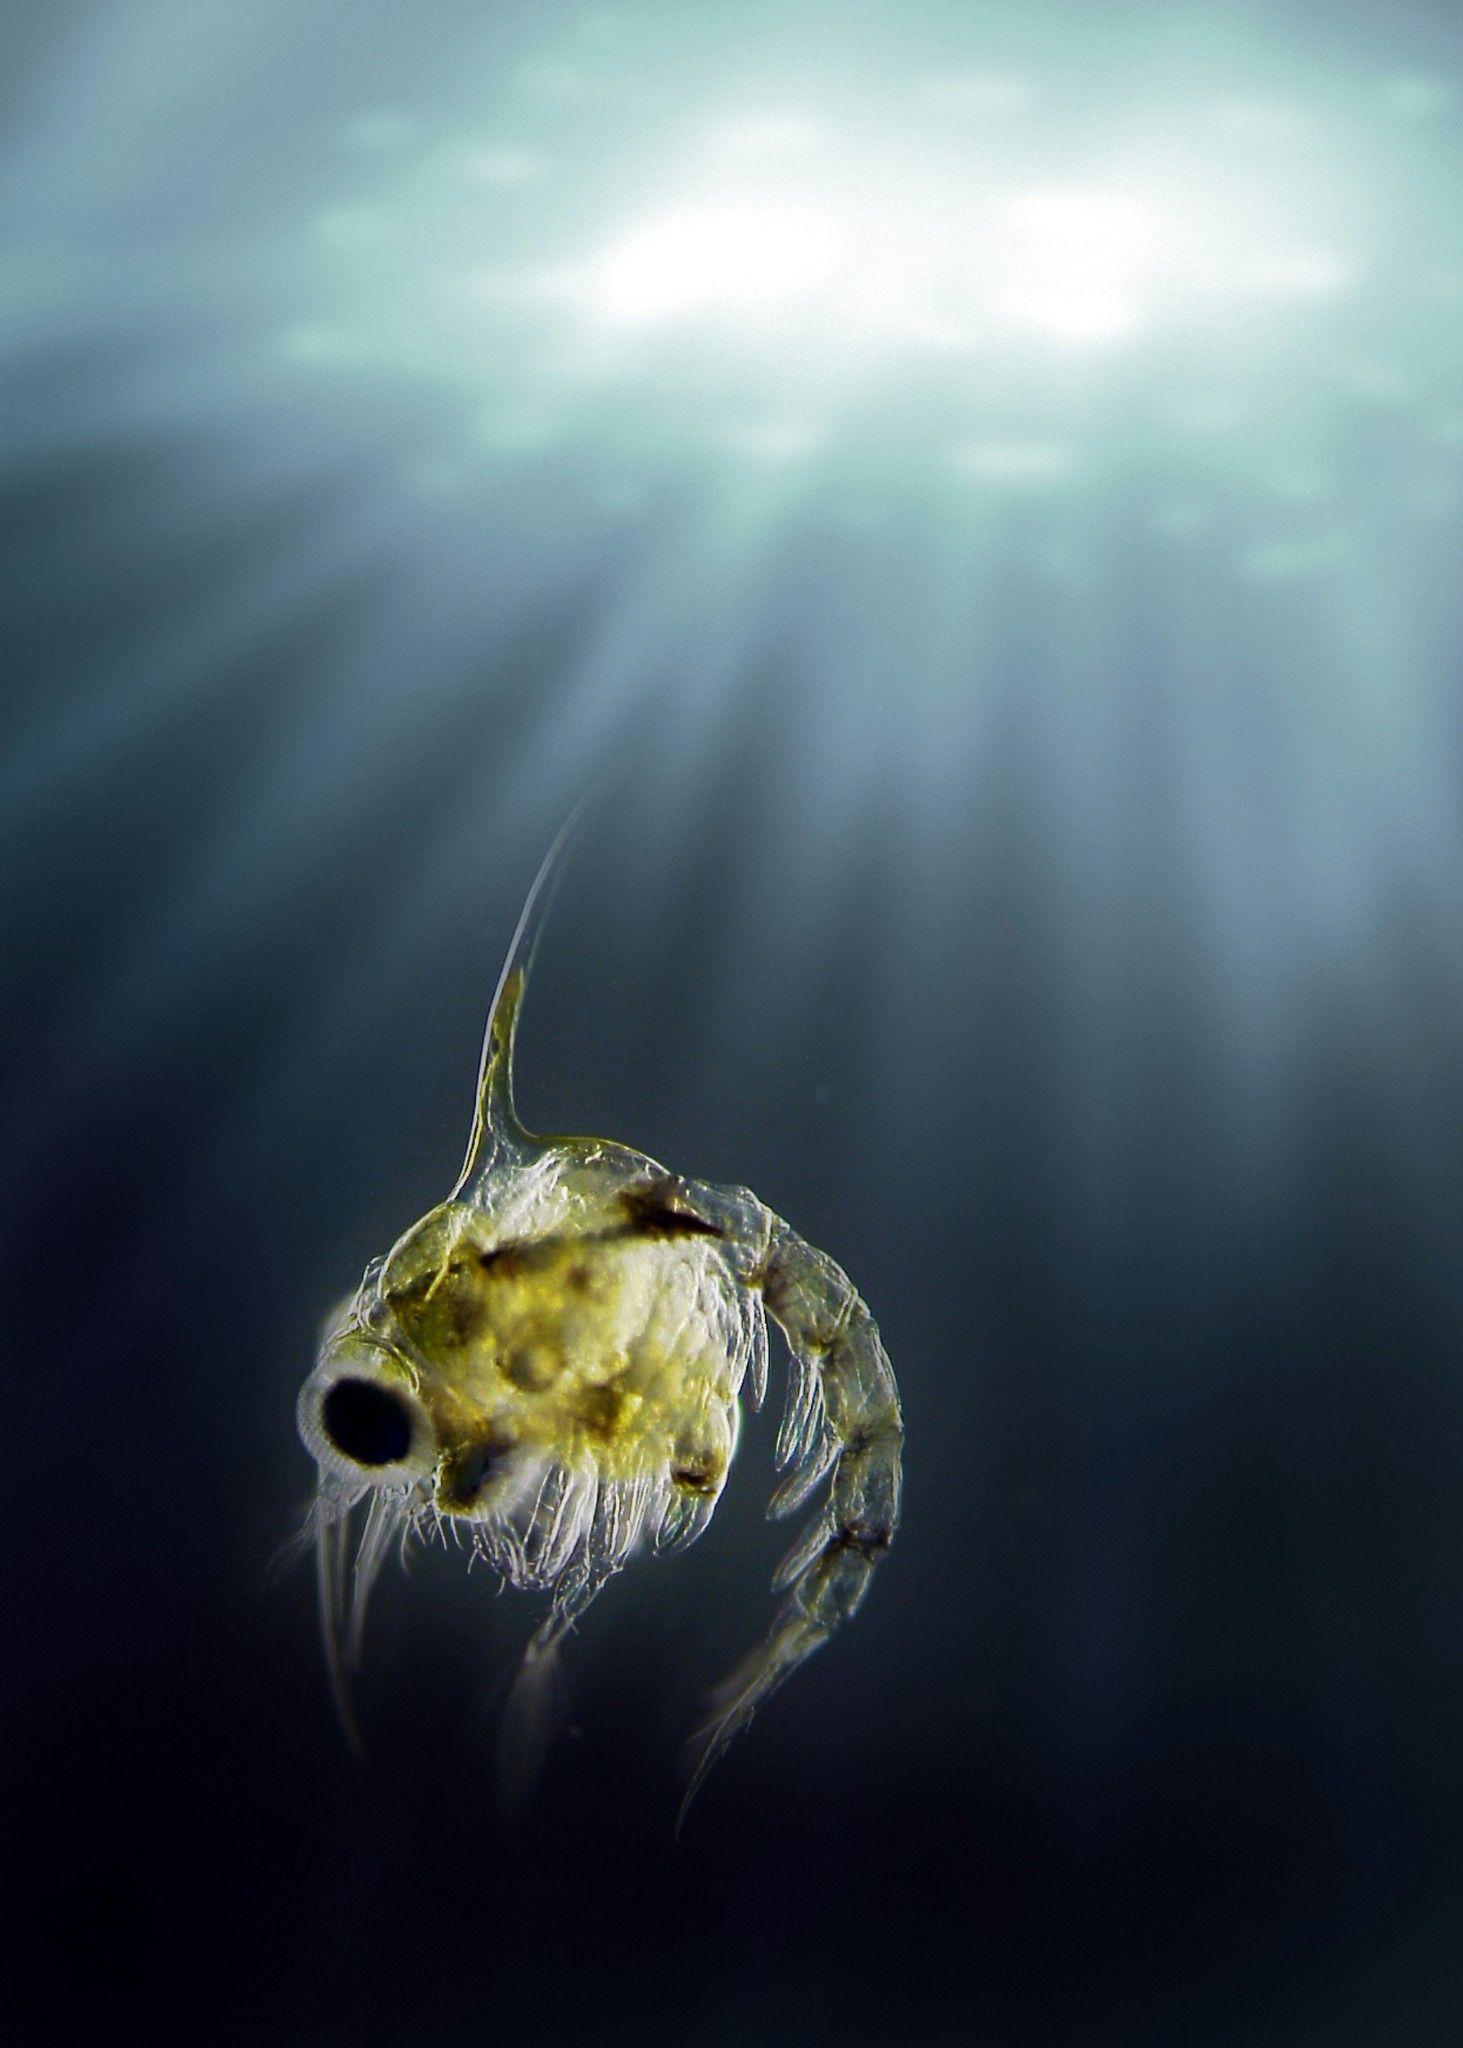 zooplankton crab larvae | Literal | Pinterest | Crabs